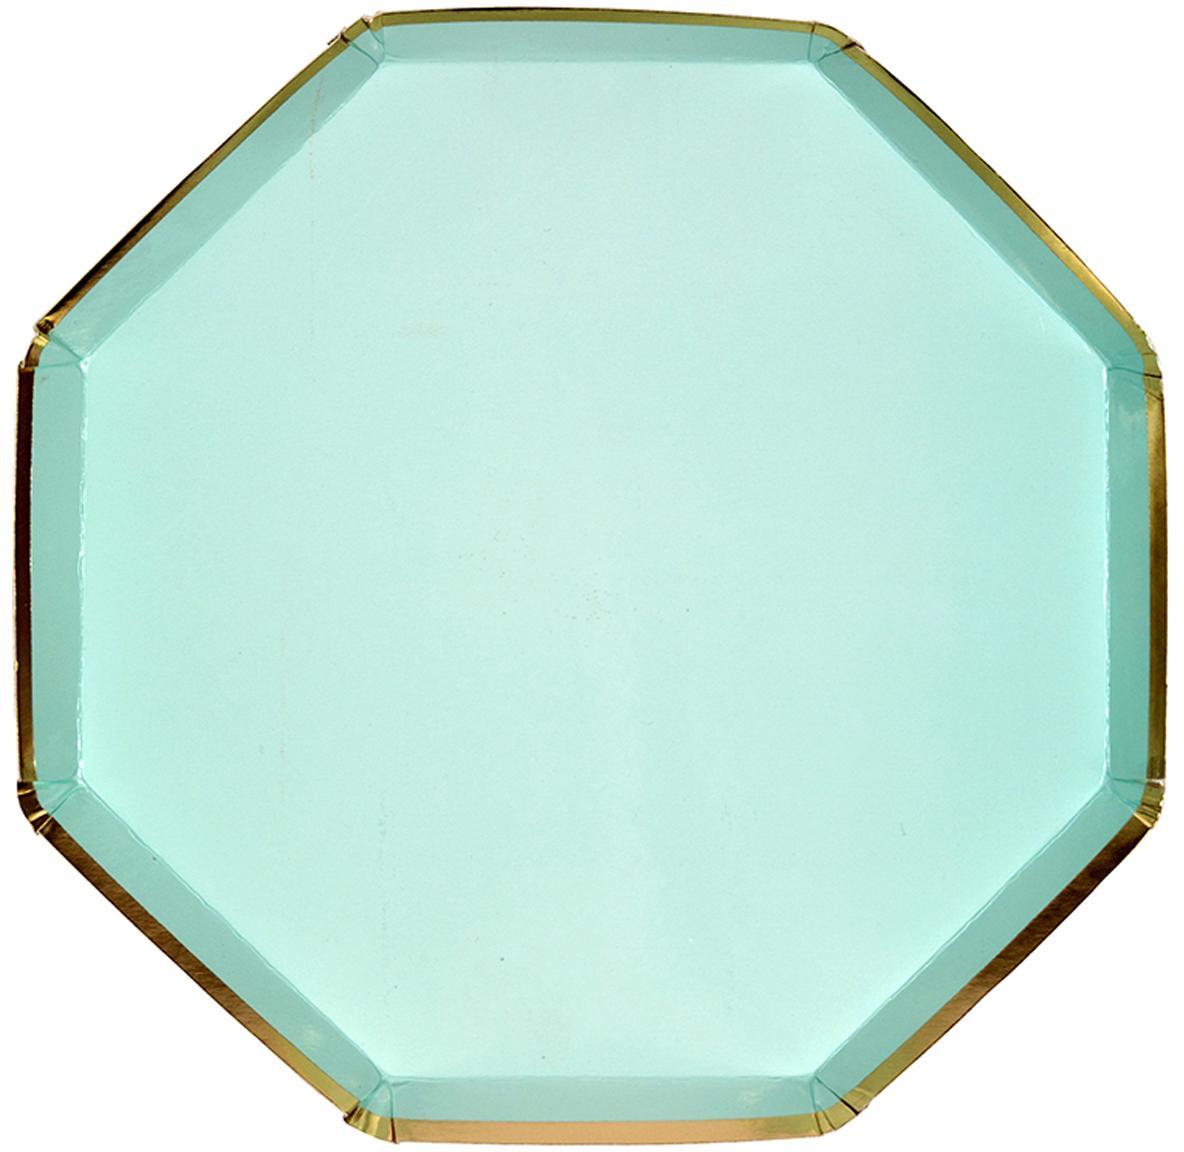 Piatto di carta Simply Eco, 8 pz., Carta, sventato, Verde menta, Ø 20 x Alt. 1 cm